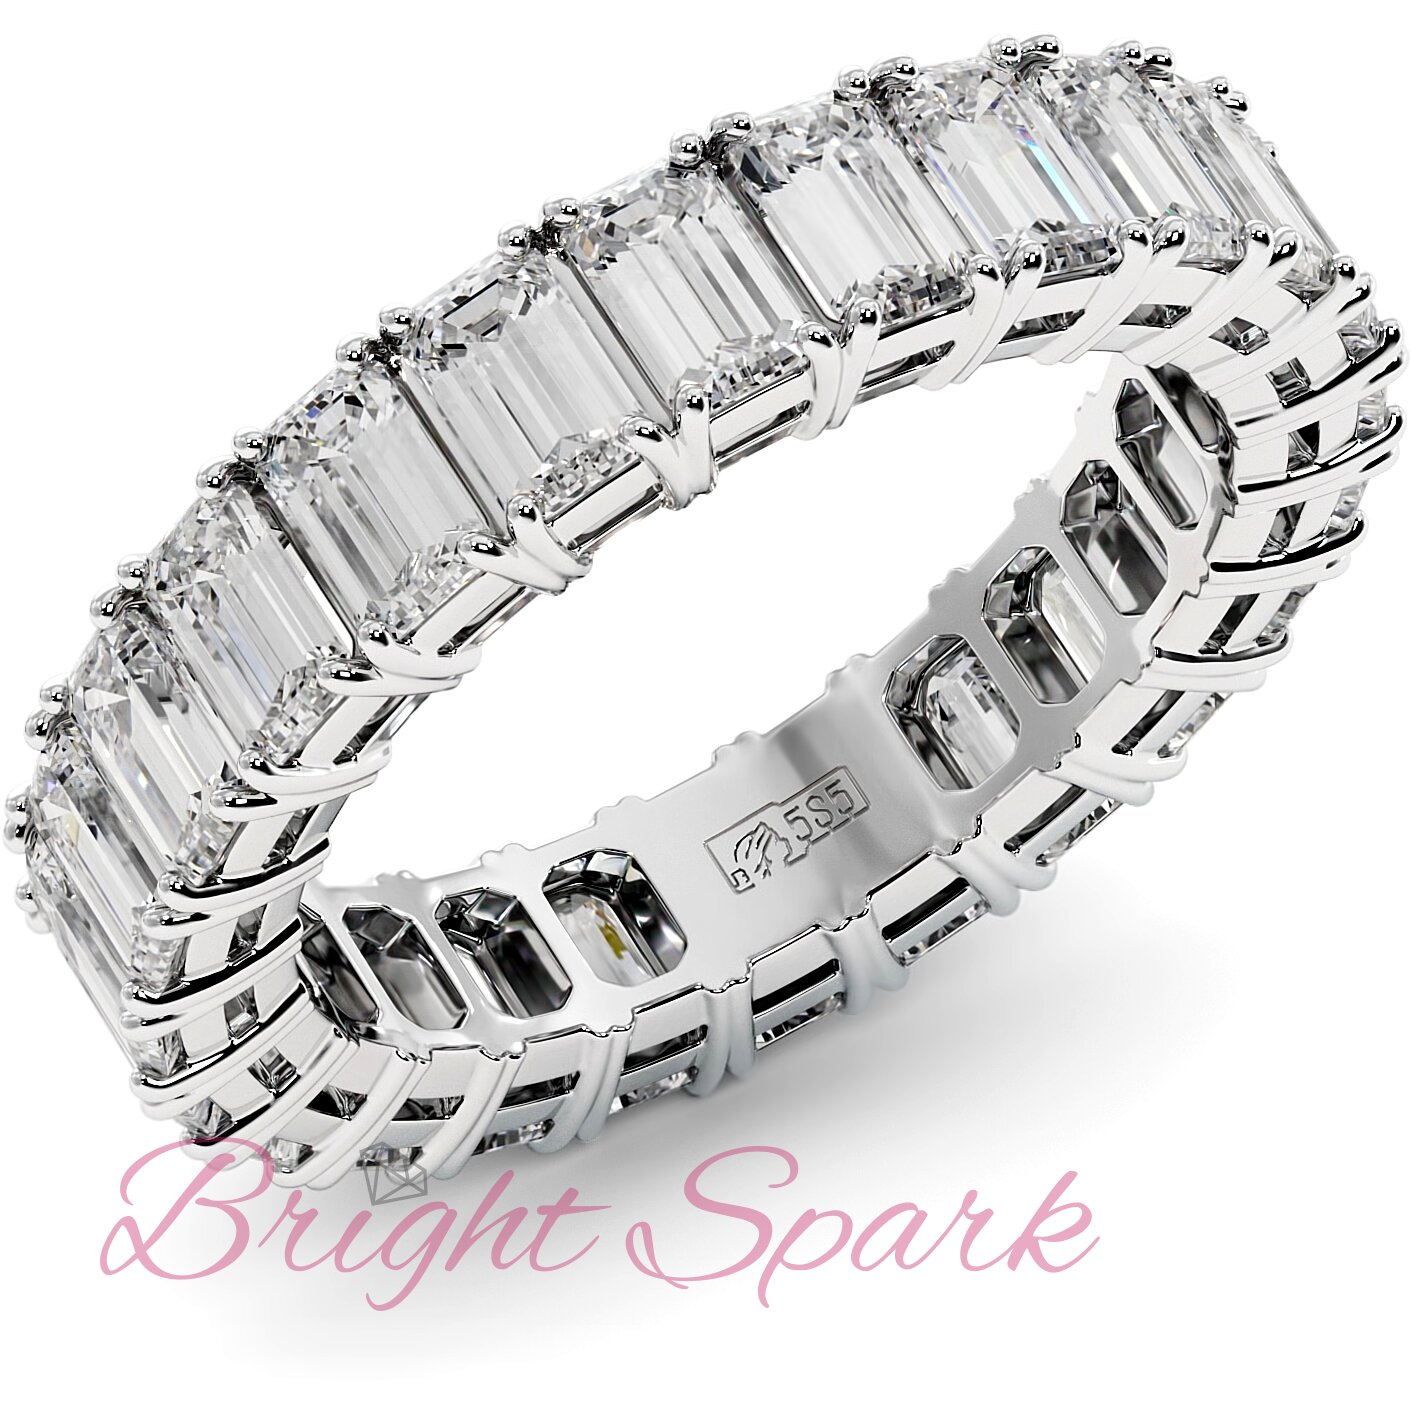 Кольцо с бриллиантами изумрудной огранки по кругу белое золото 3,6 карата